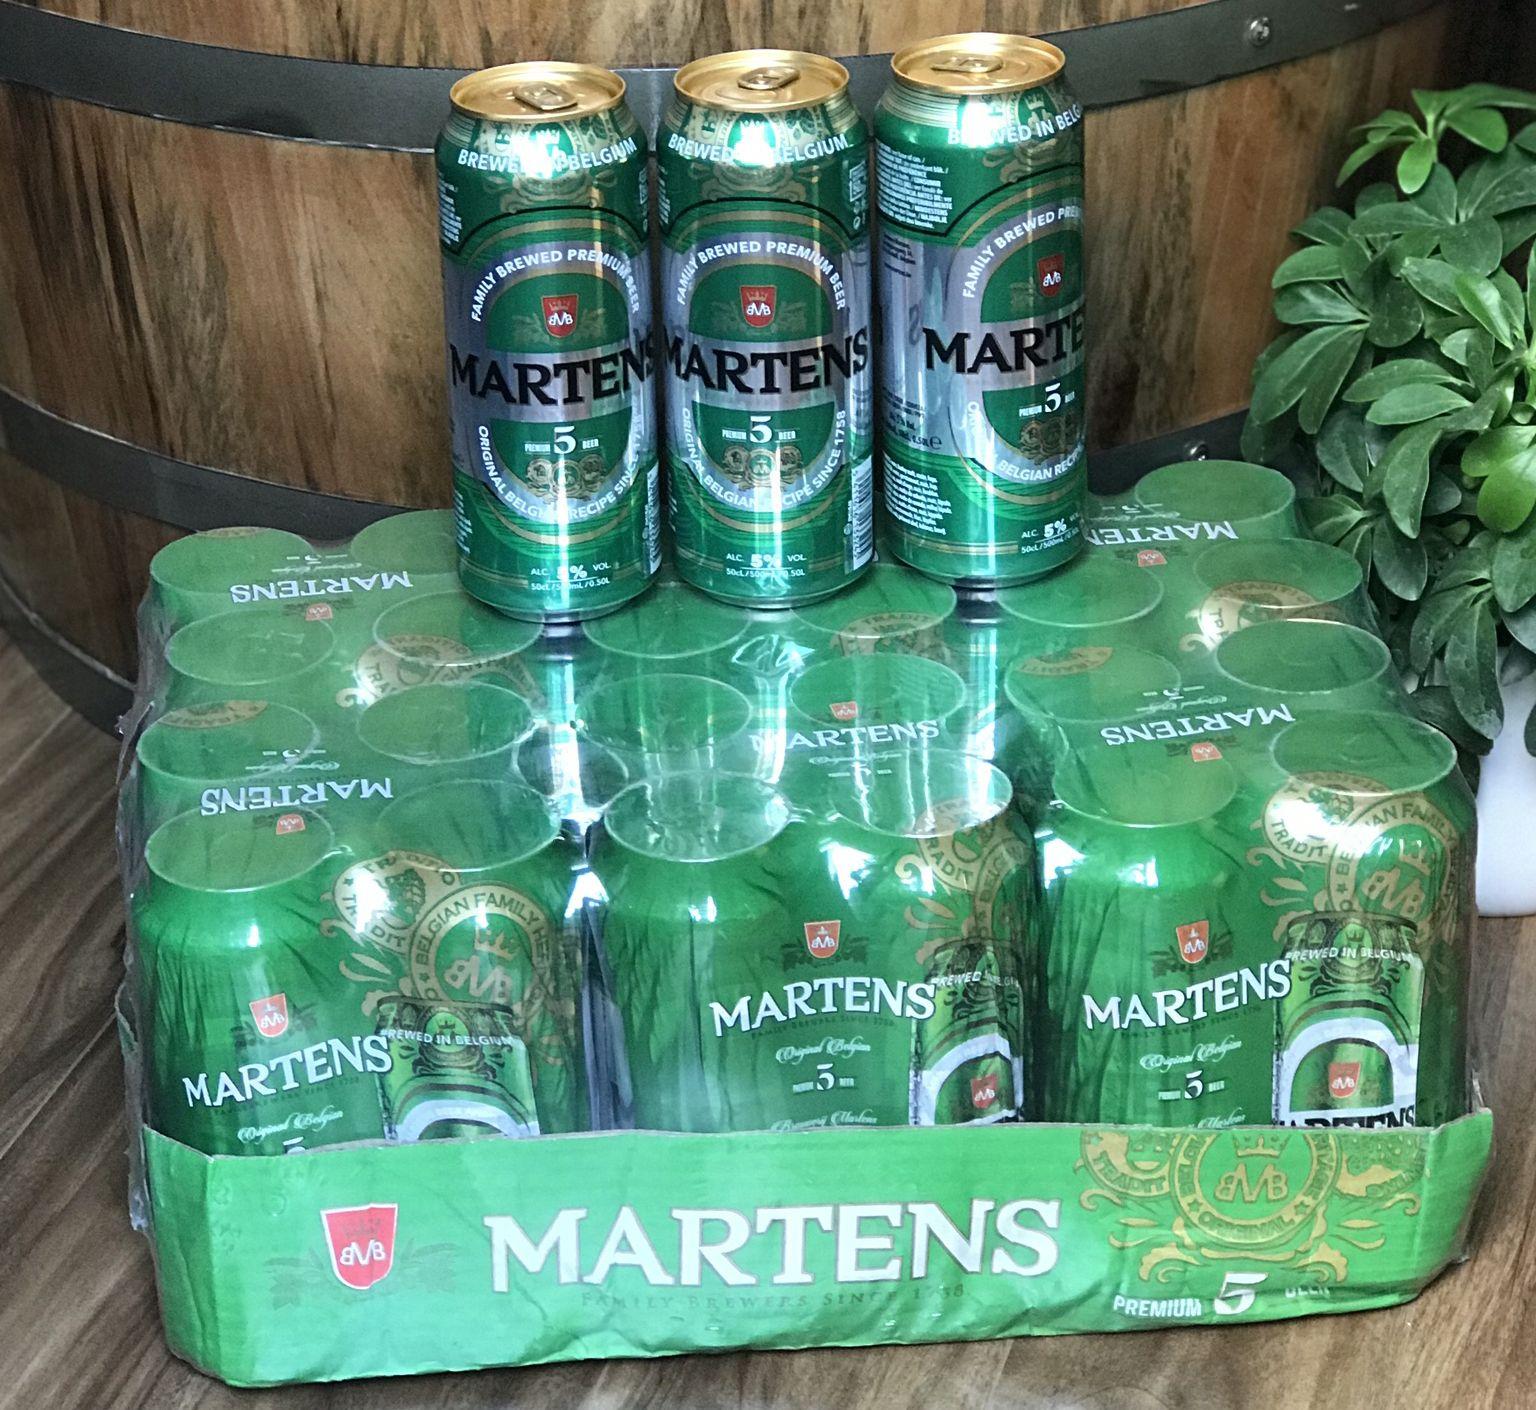 Martens Pils